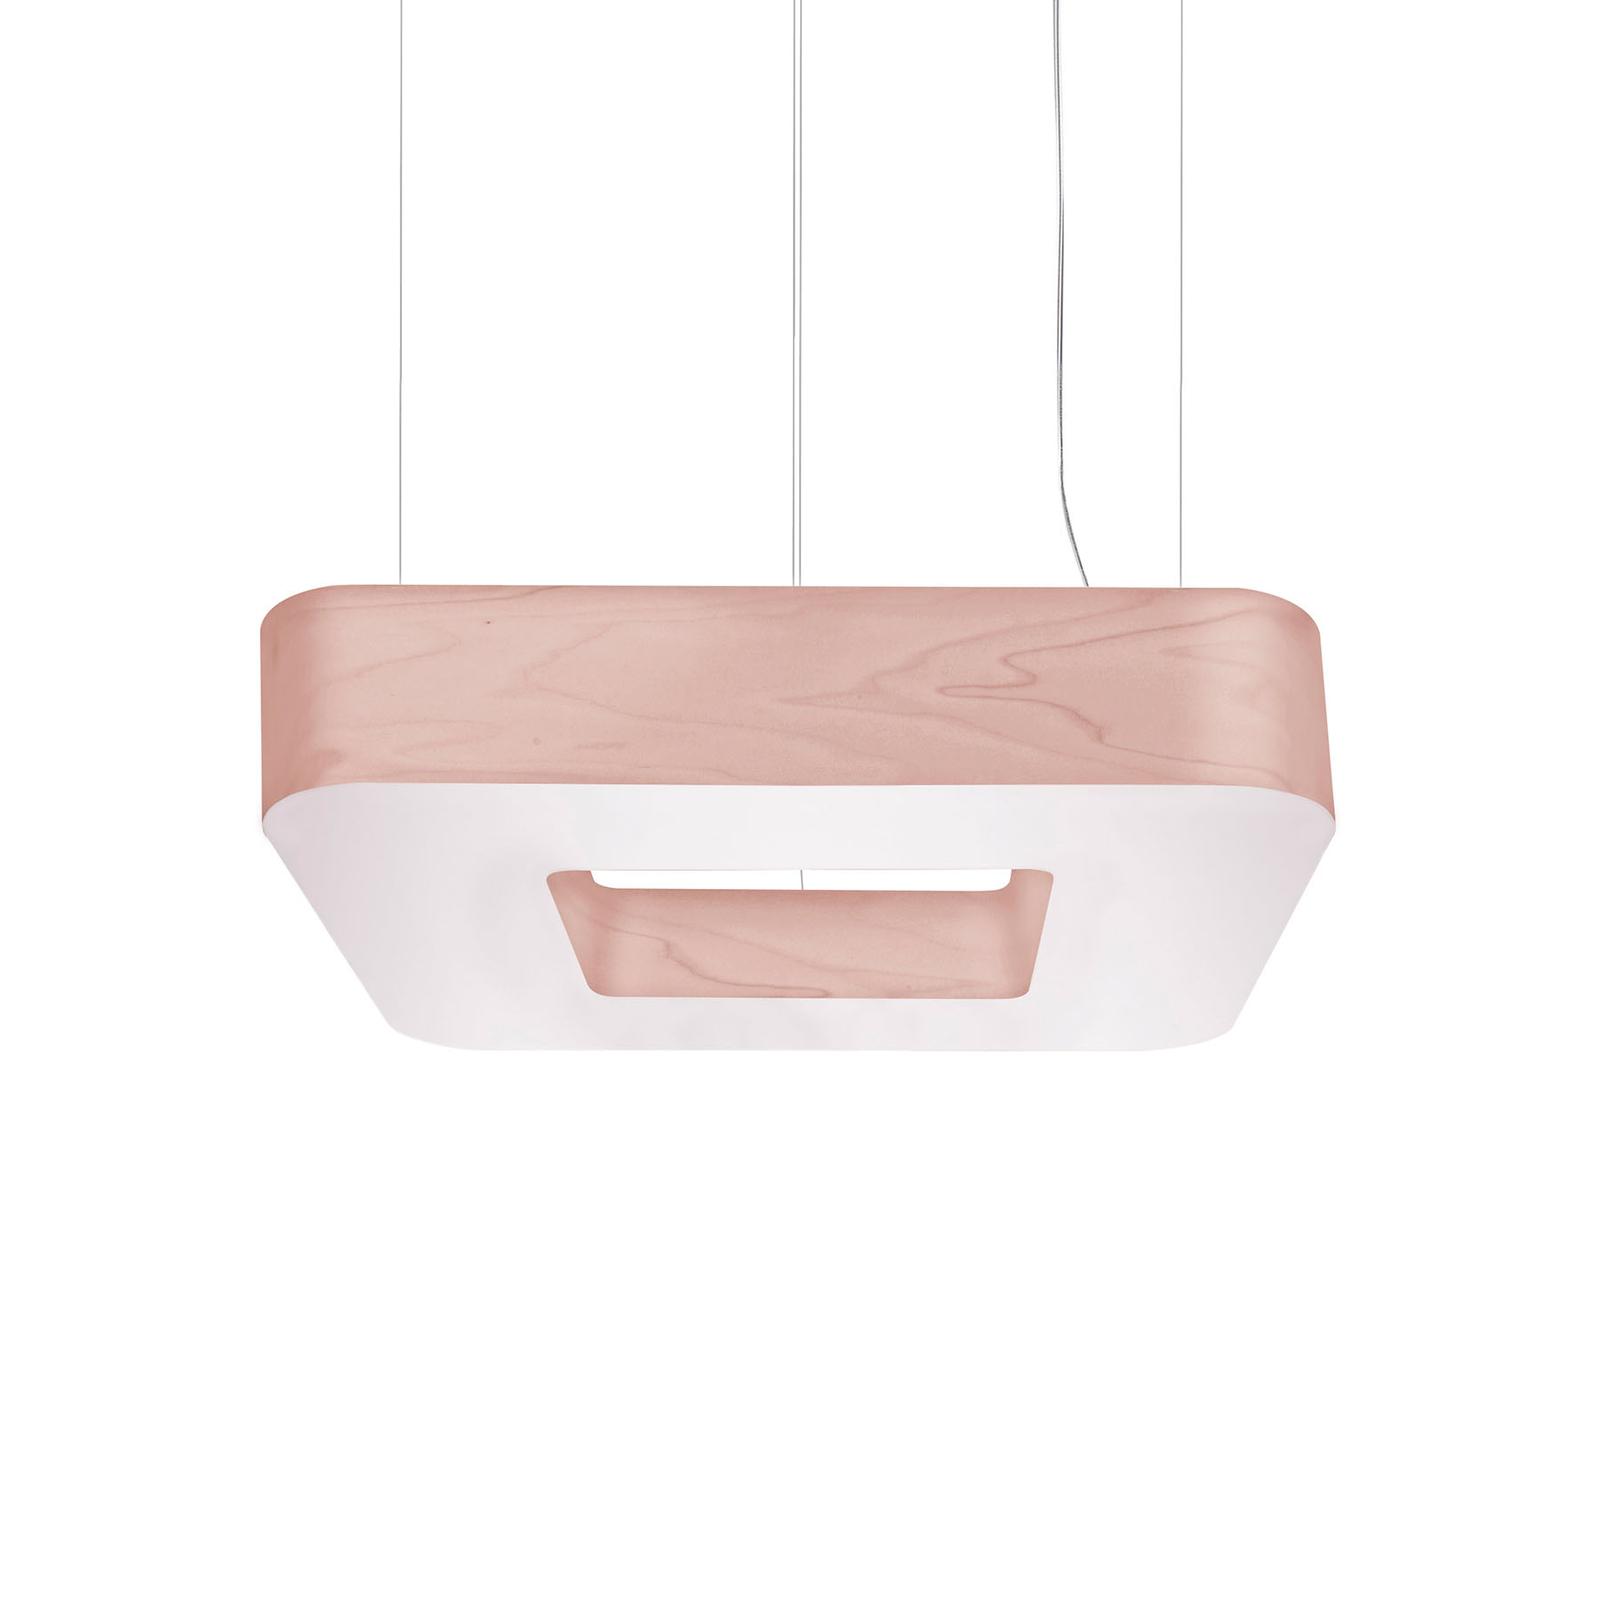 LZF Cuad LED-Hängeleuchte 0-10V dim, rosé